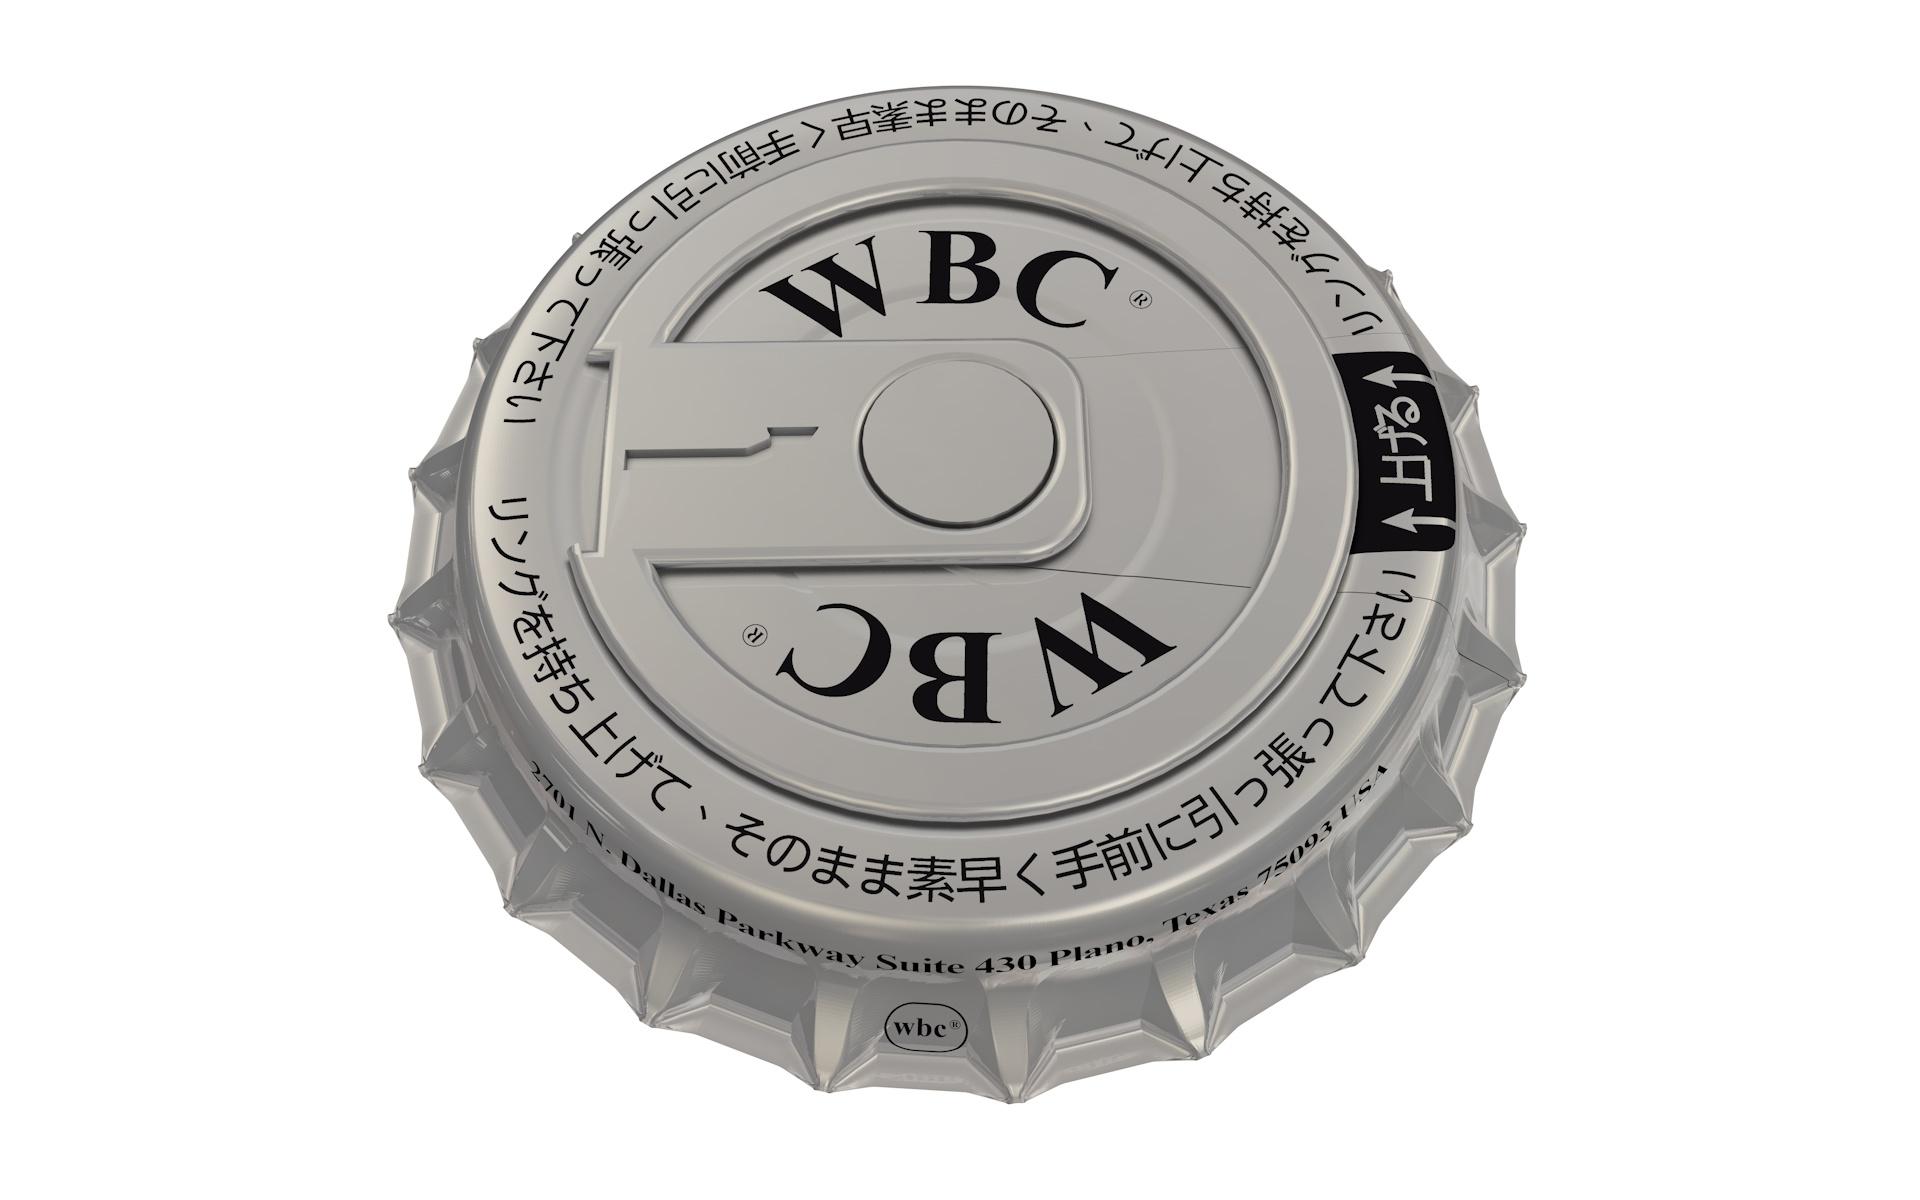 epbc-wbc-lift-ar-jpn-001_0000